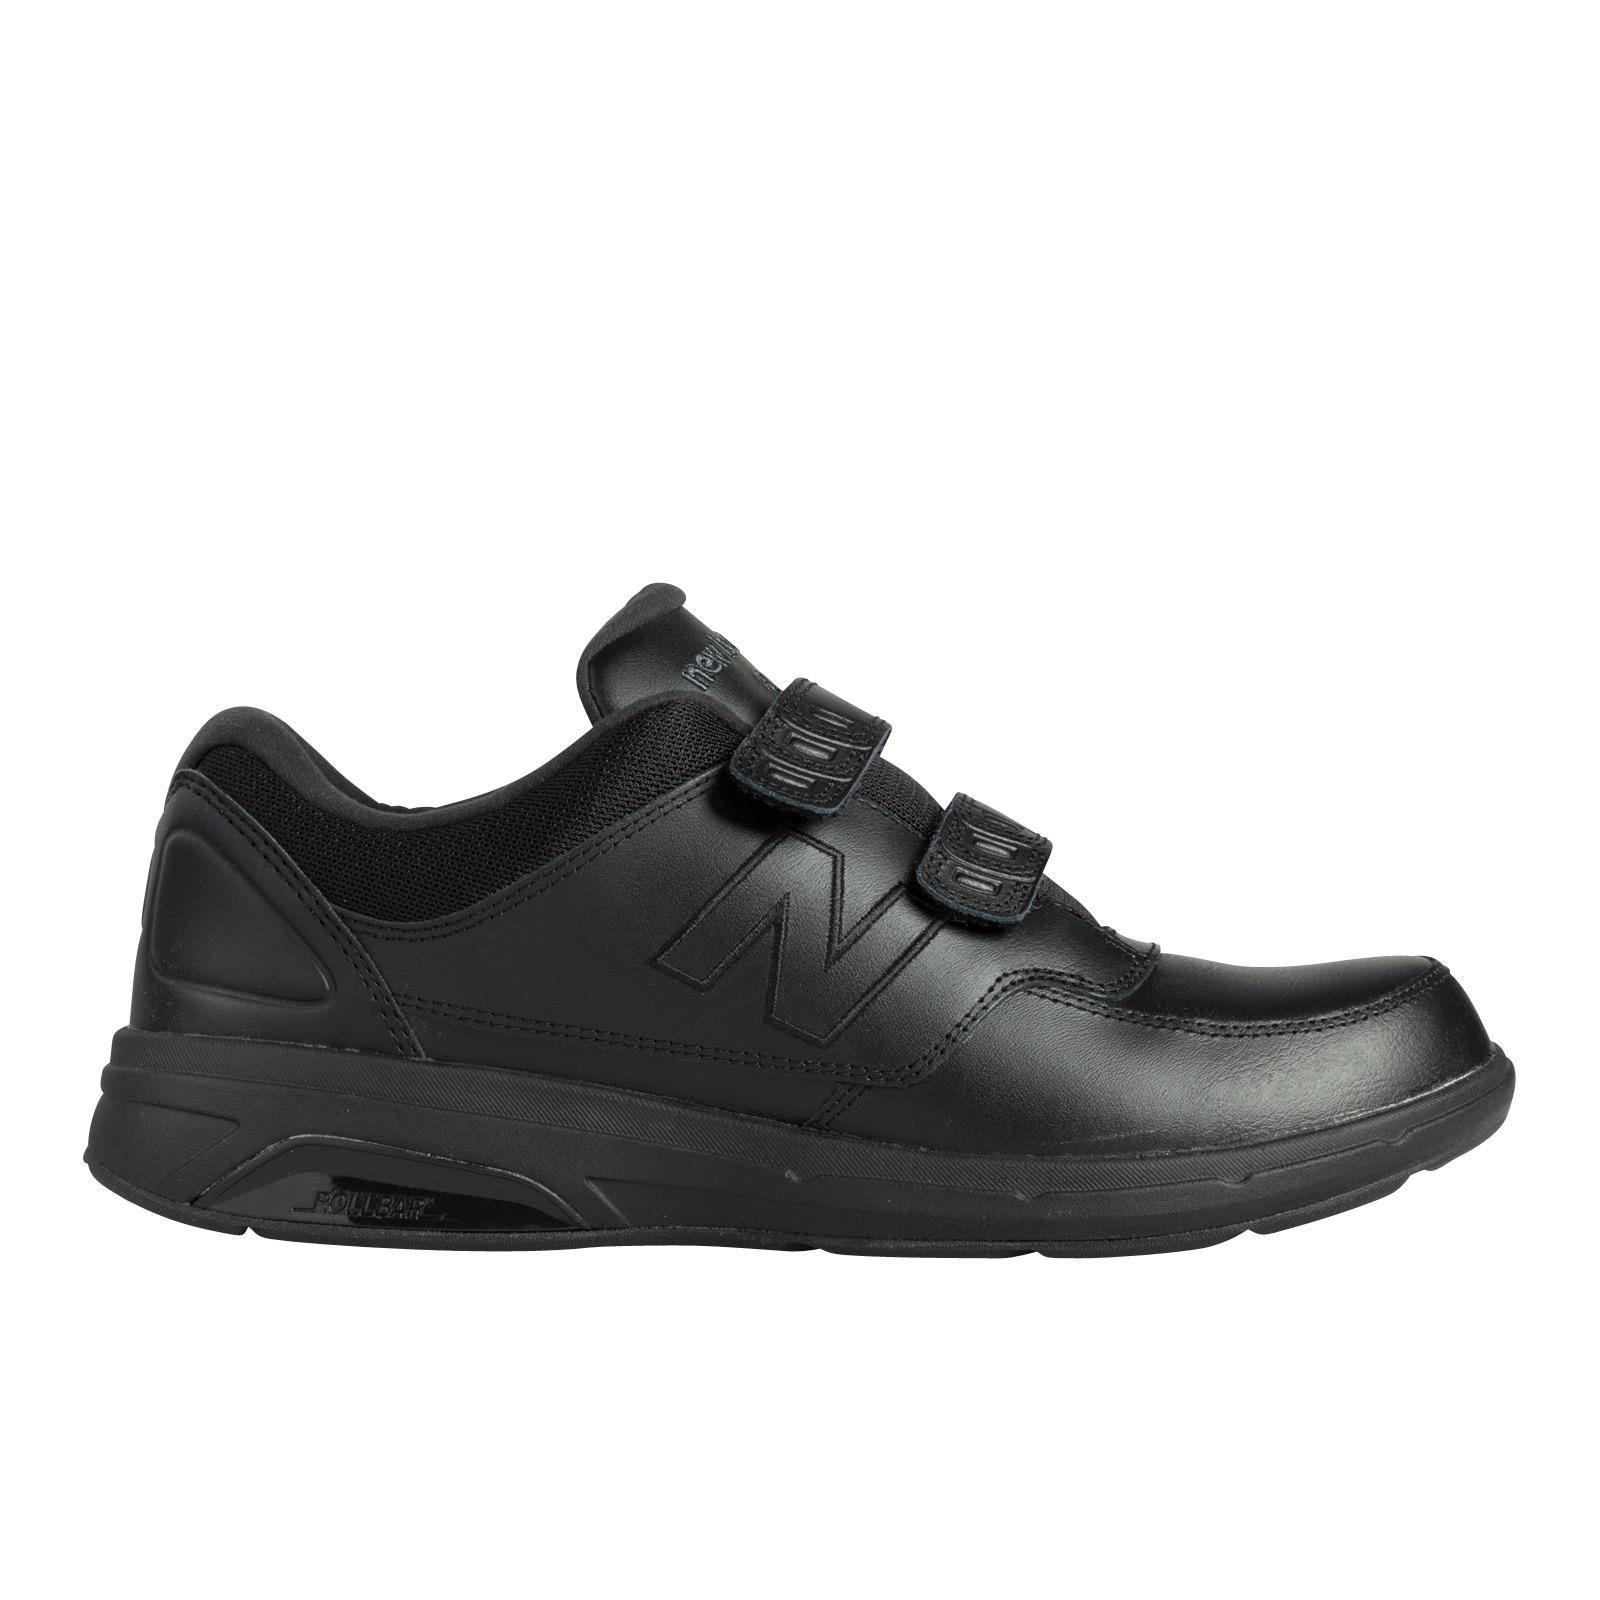 Mens 813 Walking Velcro by New Balance